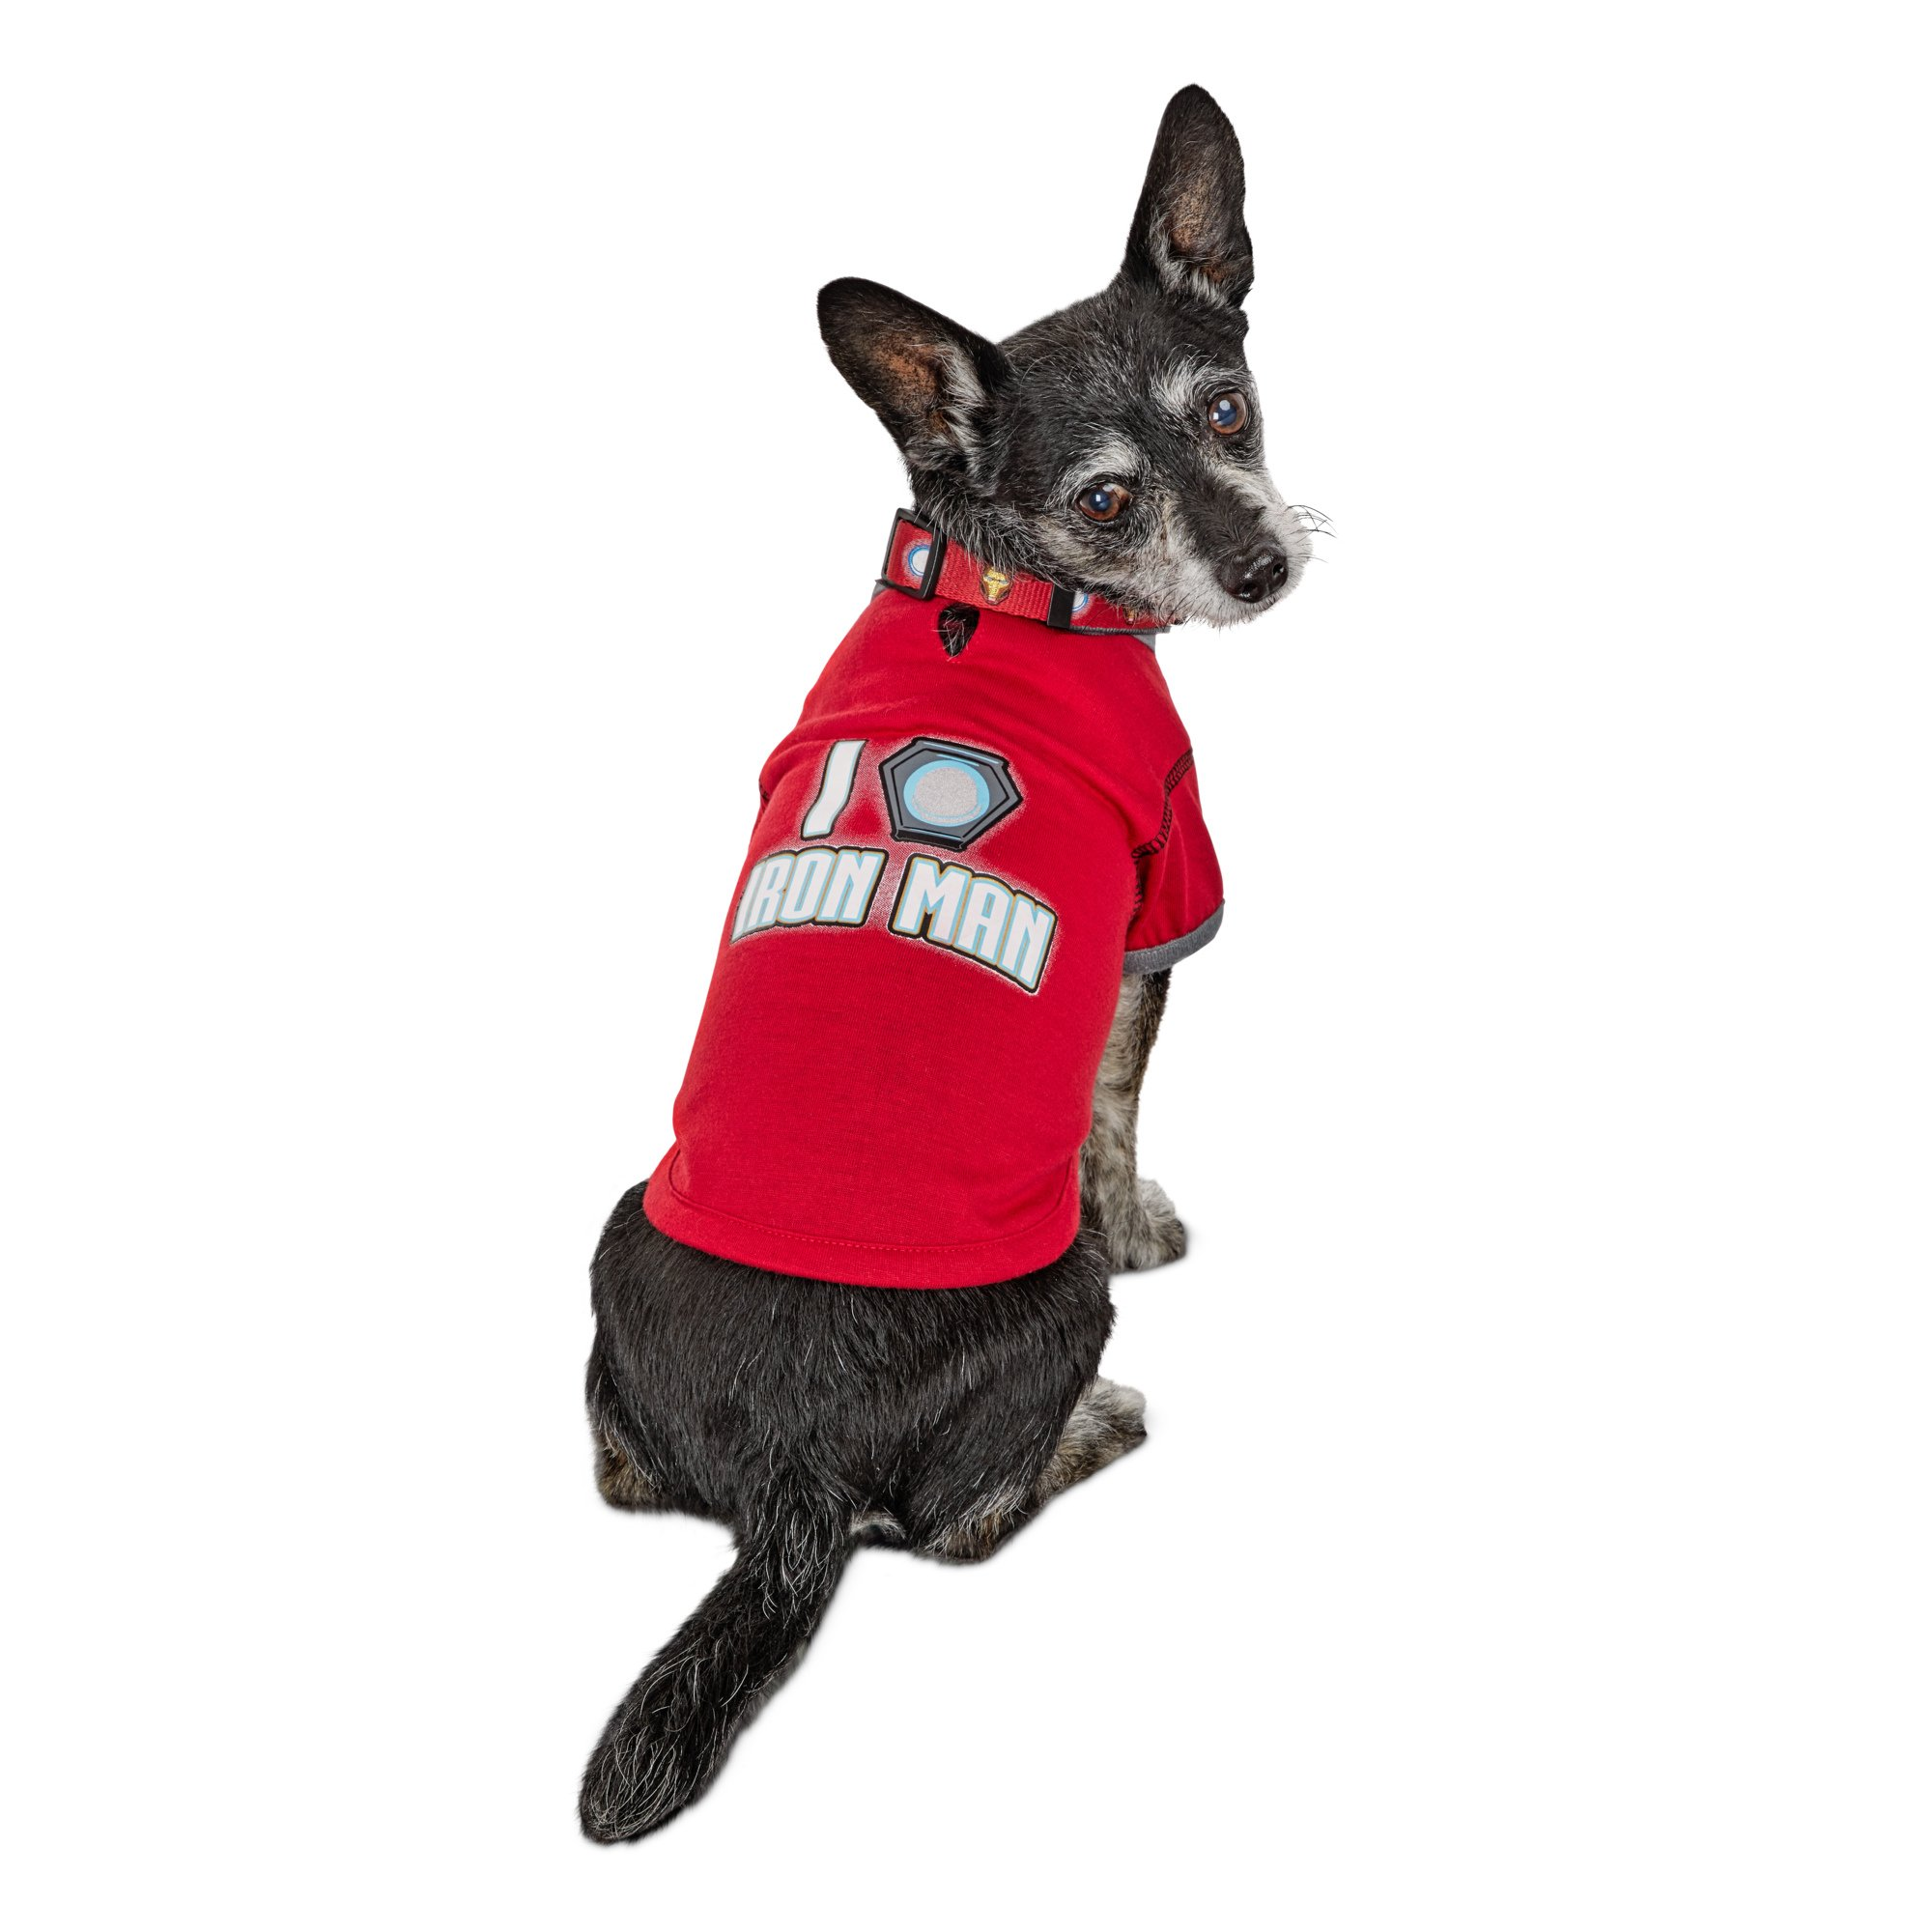 timeless design b5701 eb194 Marvel Avengers I Heart Iron Man Dog T-Shirt, X-Small | Petco